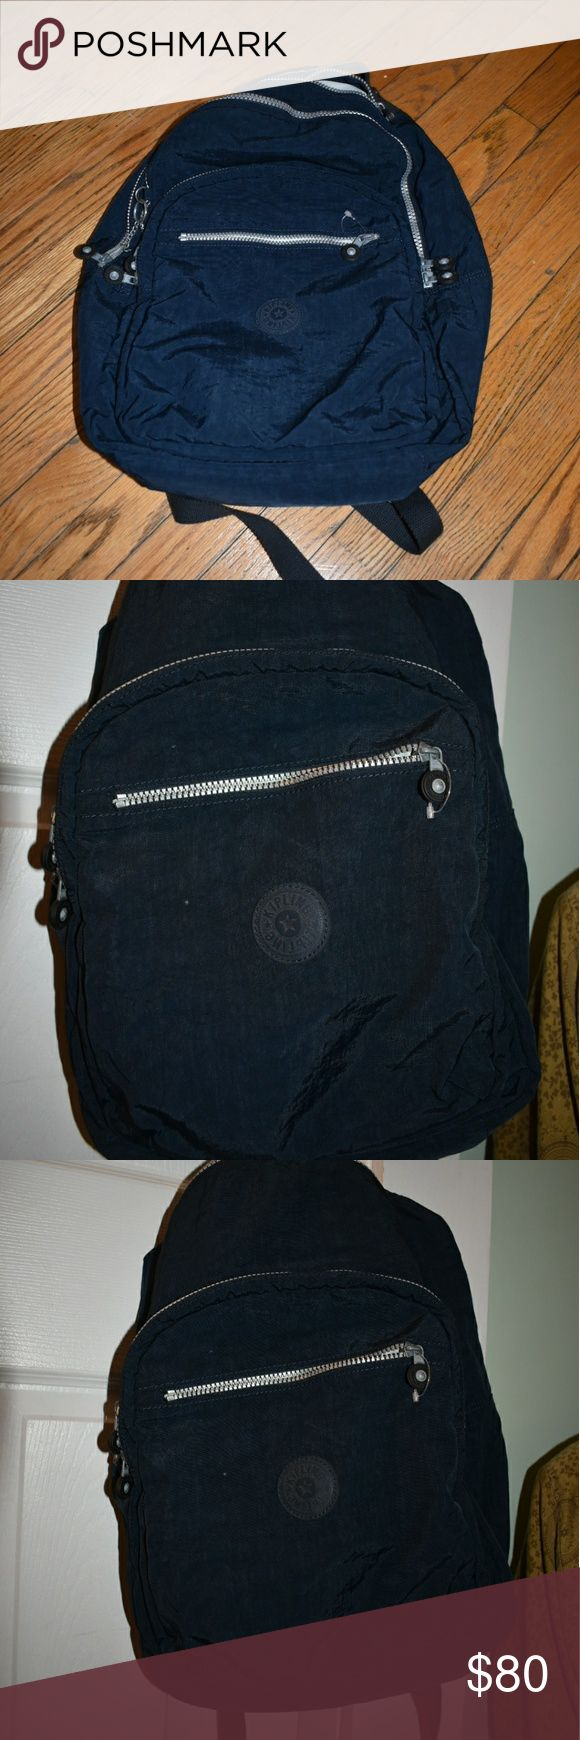 25 best ideas about kipling backpack on pinterest school handbags - Kipling Book Bag Navy Blue Great Condition Like New Kipling Backpack Multiple Compartments